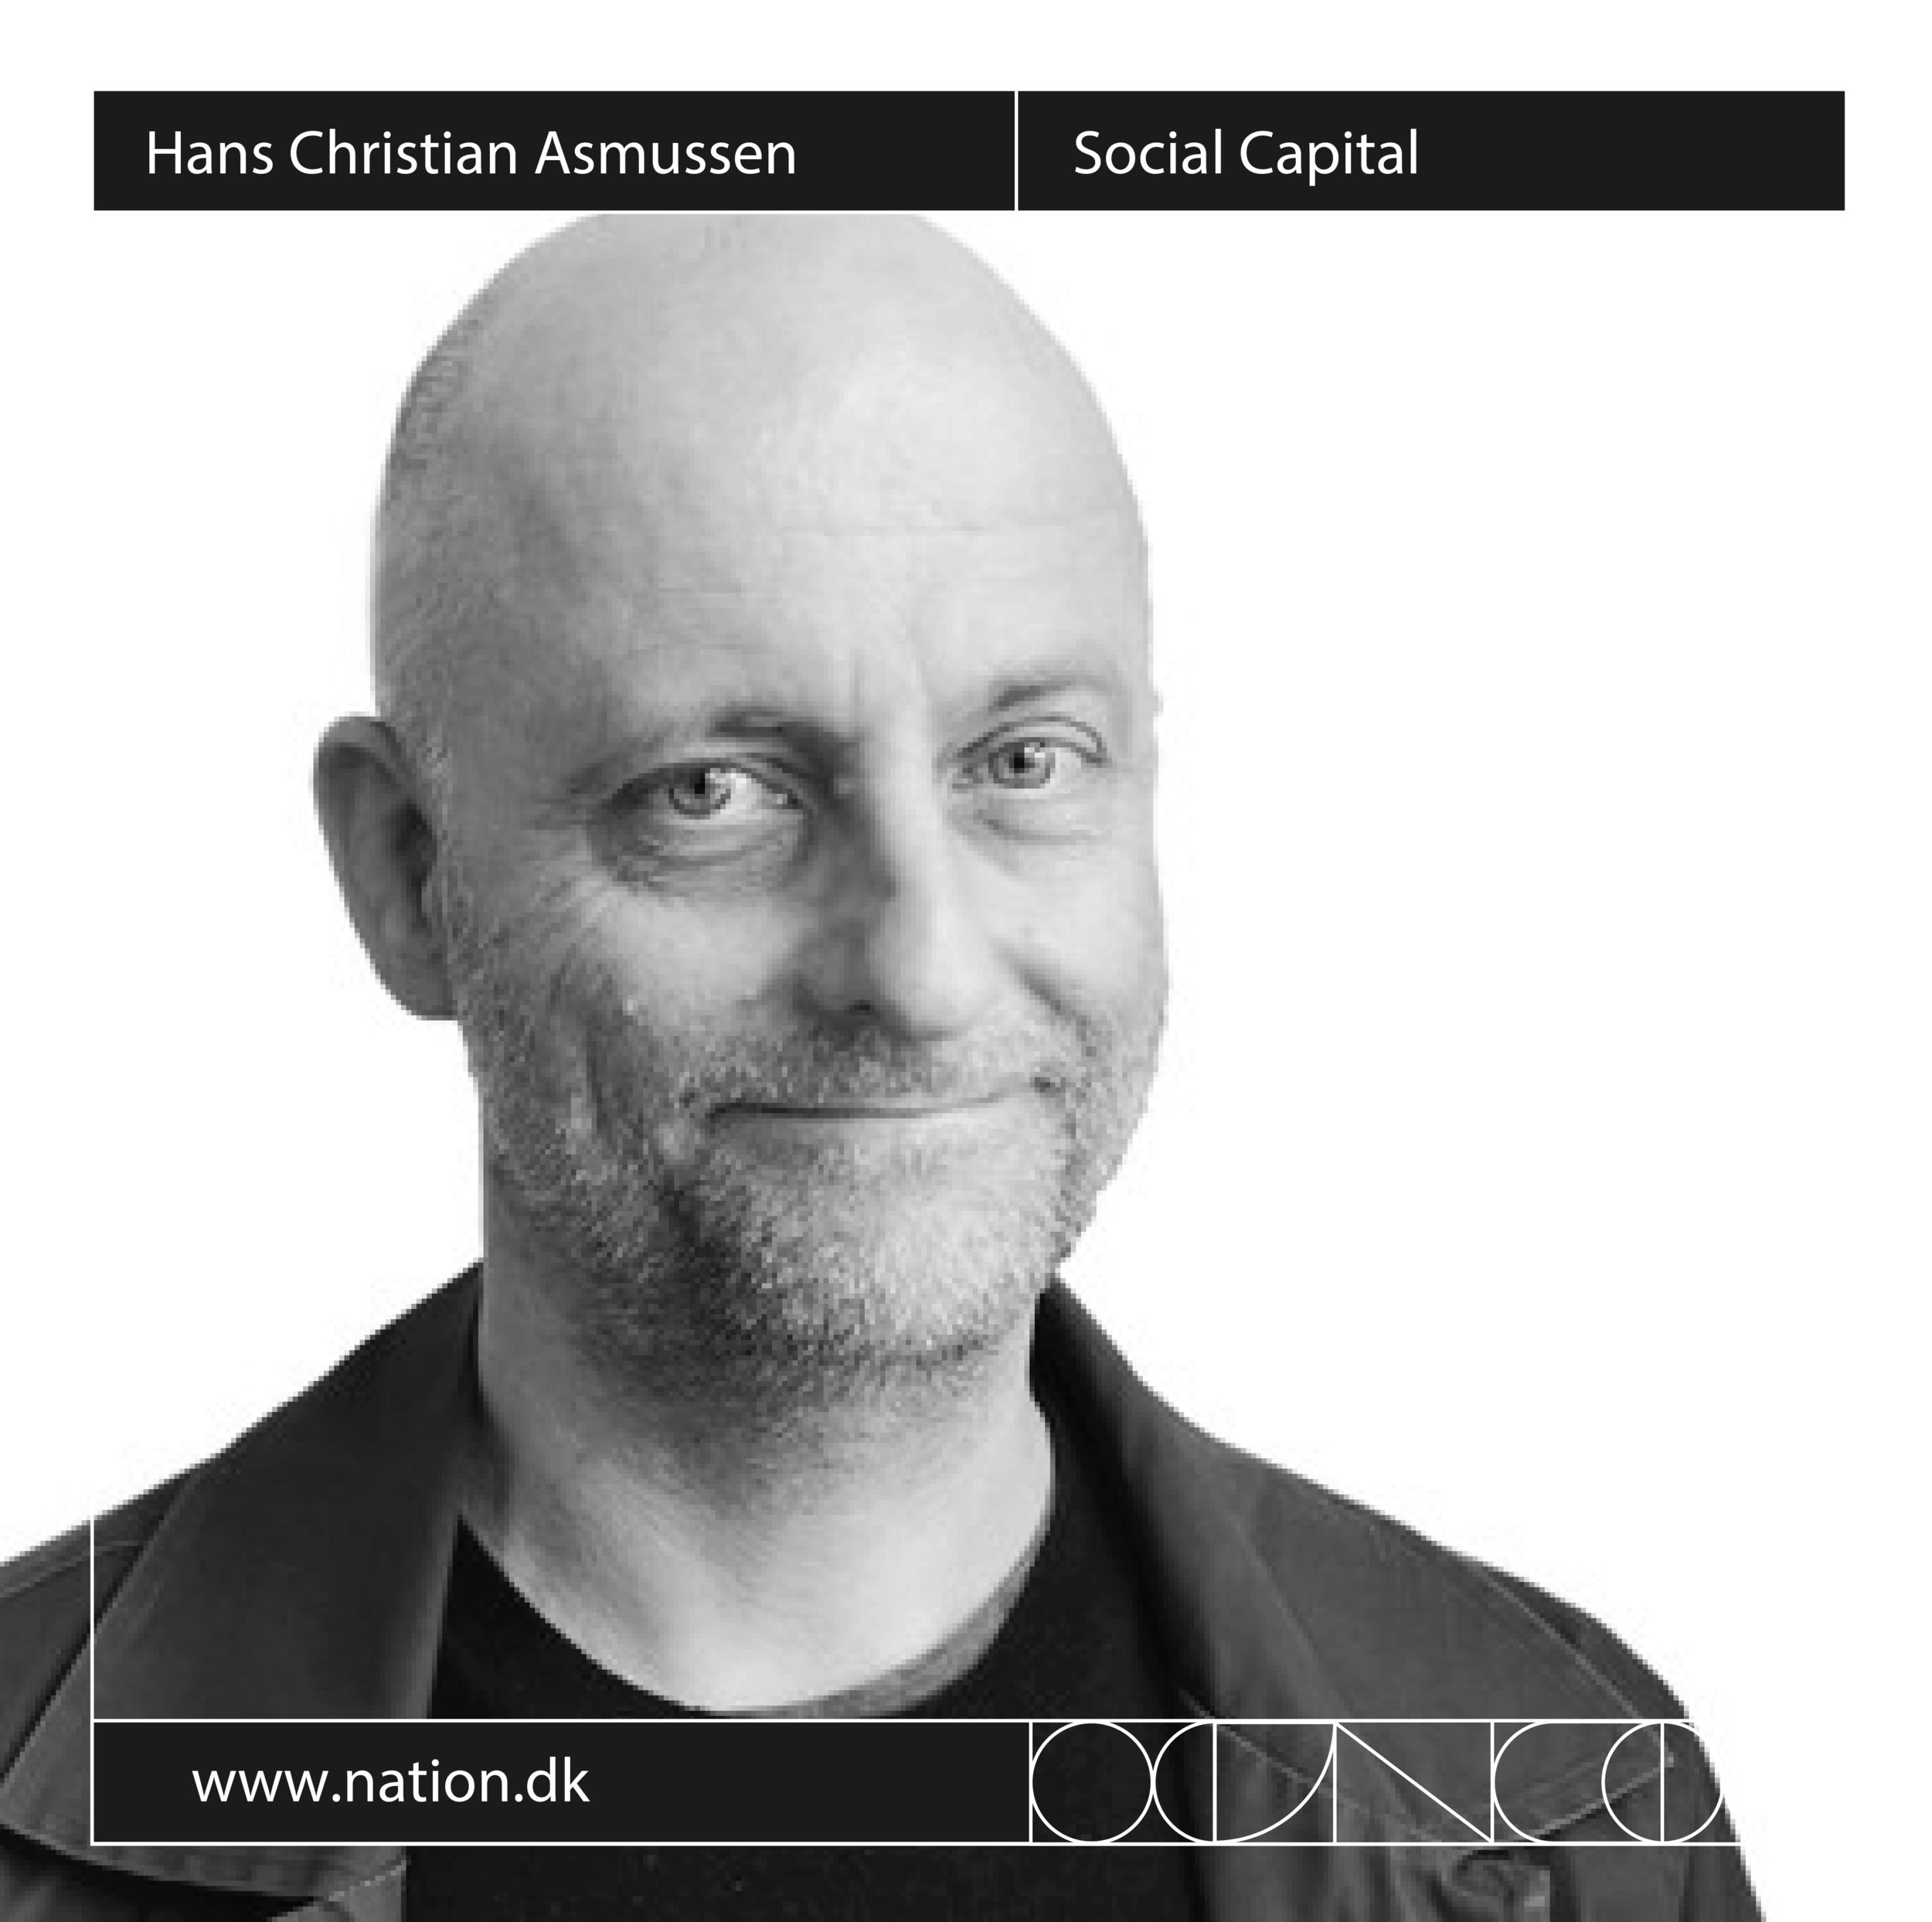 A25.04 Hans Christian Asmussen, Social Capital-01.png